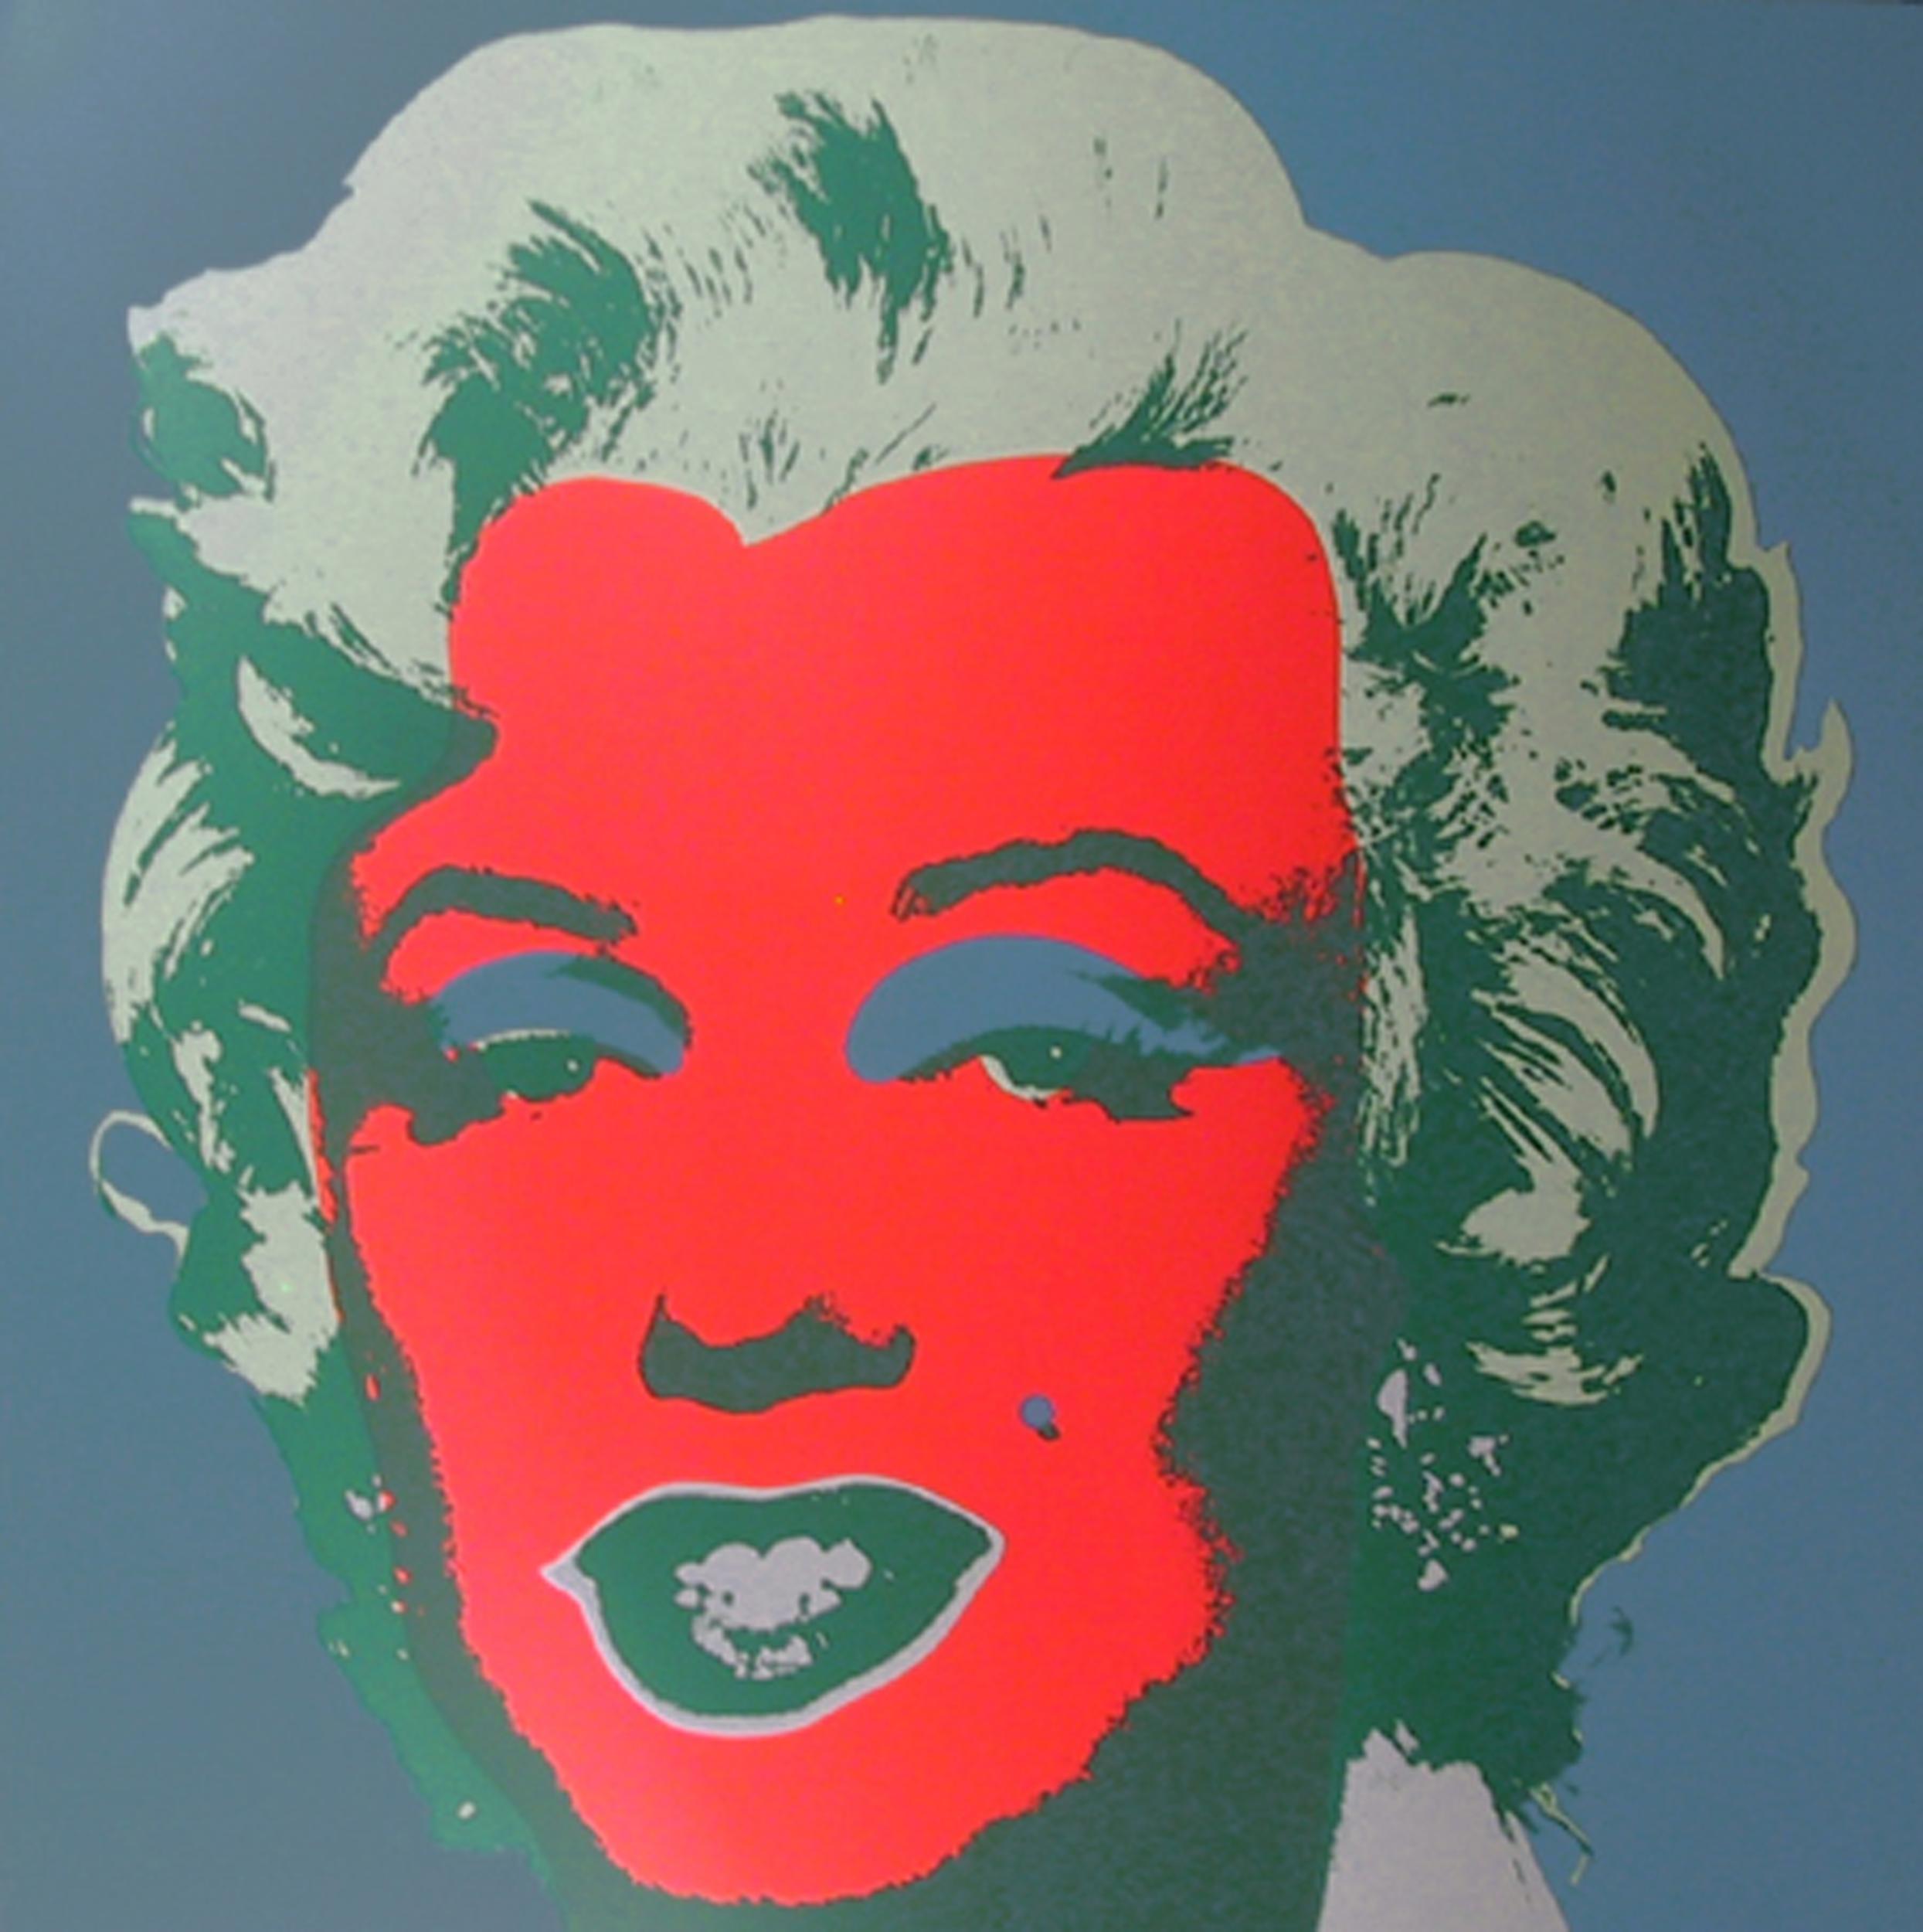 Andy Warhol, Marilyn Monroe (II.30), Serigraph